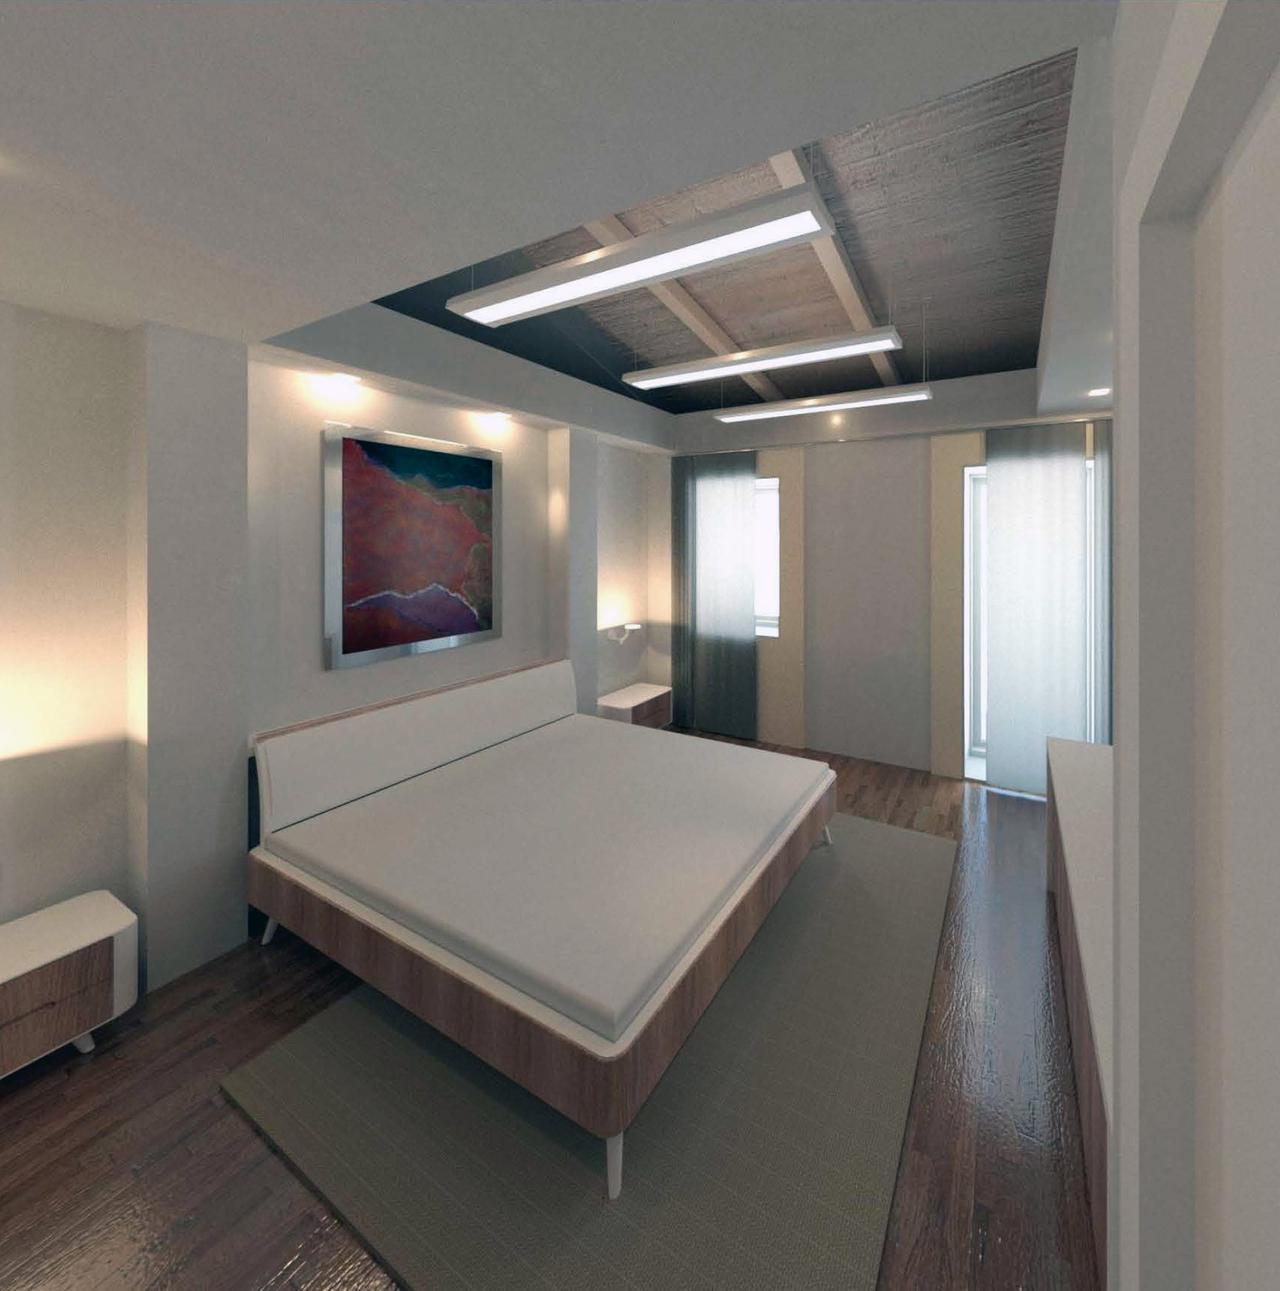 lefkada_interiors_attic_masterbdr_03.jpg